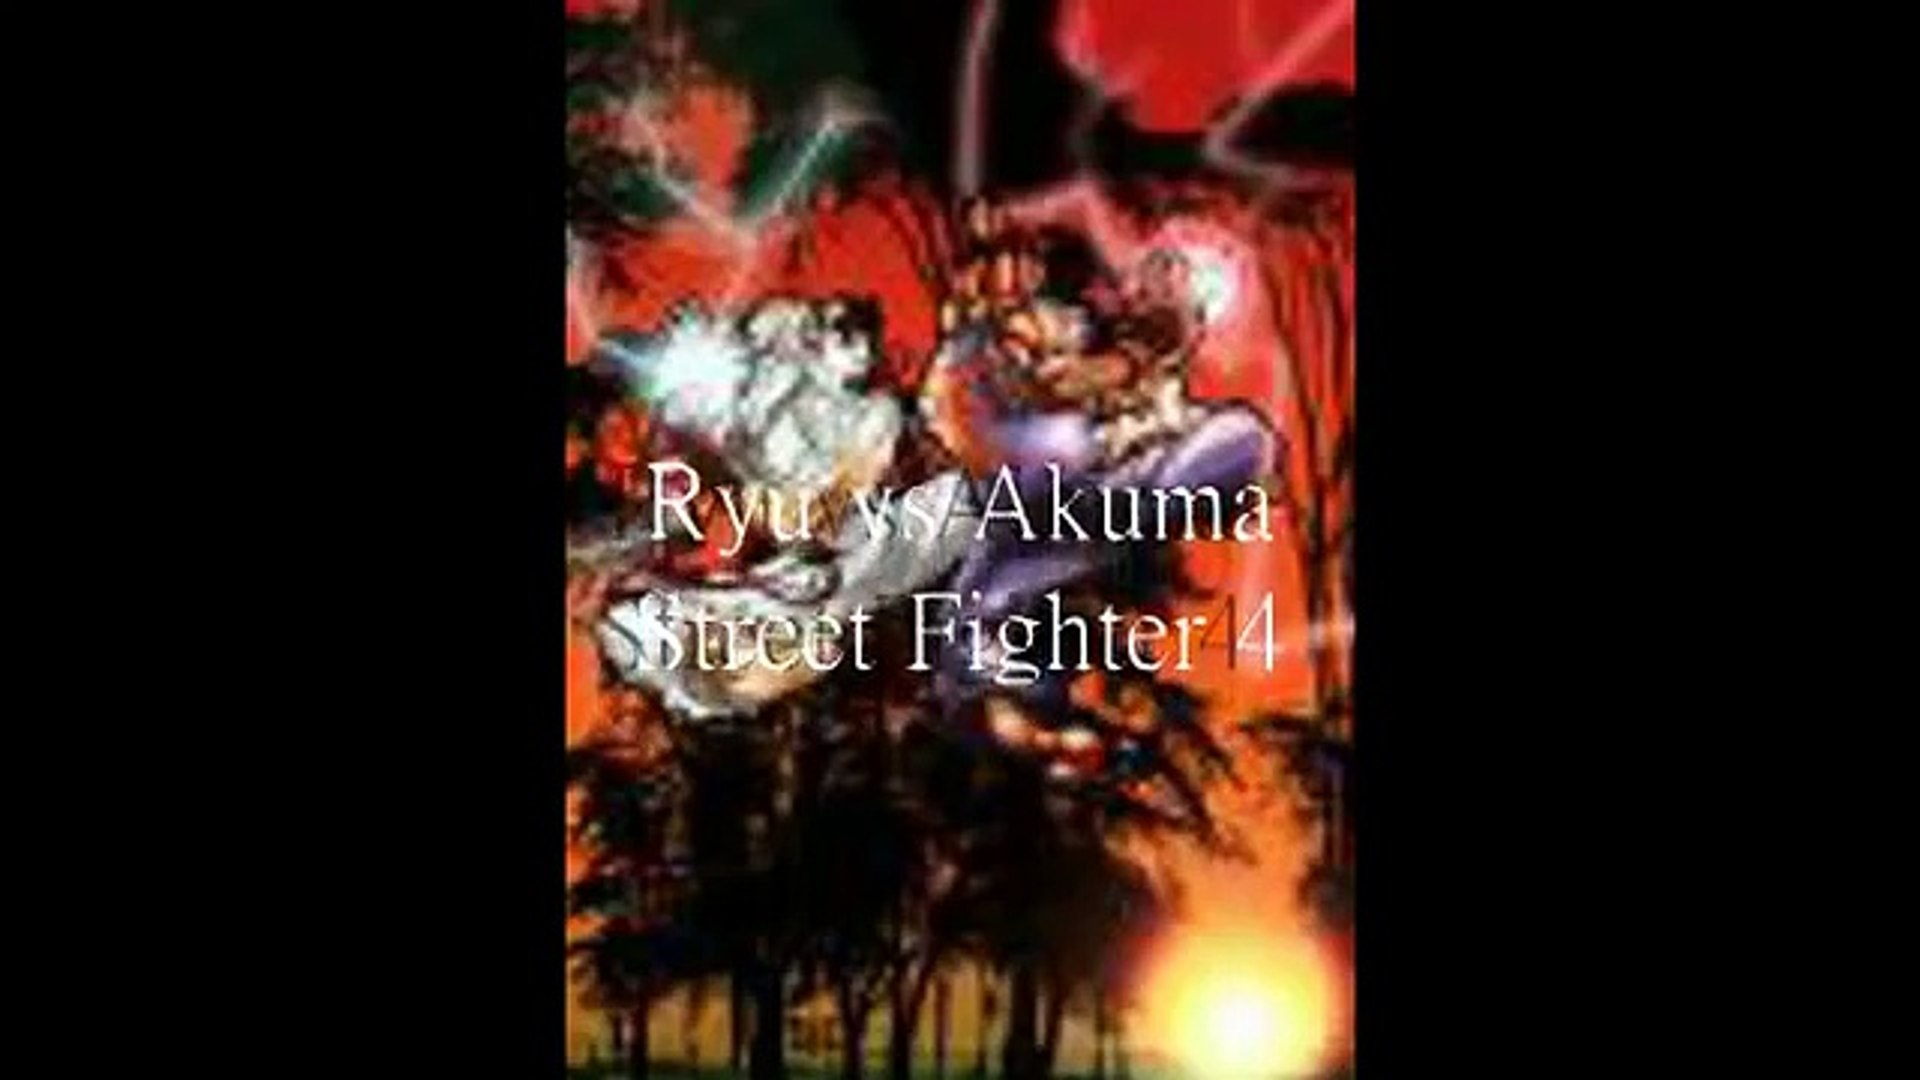 Street Fighter 4 Ryu Vs Akuma